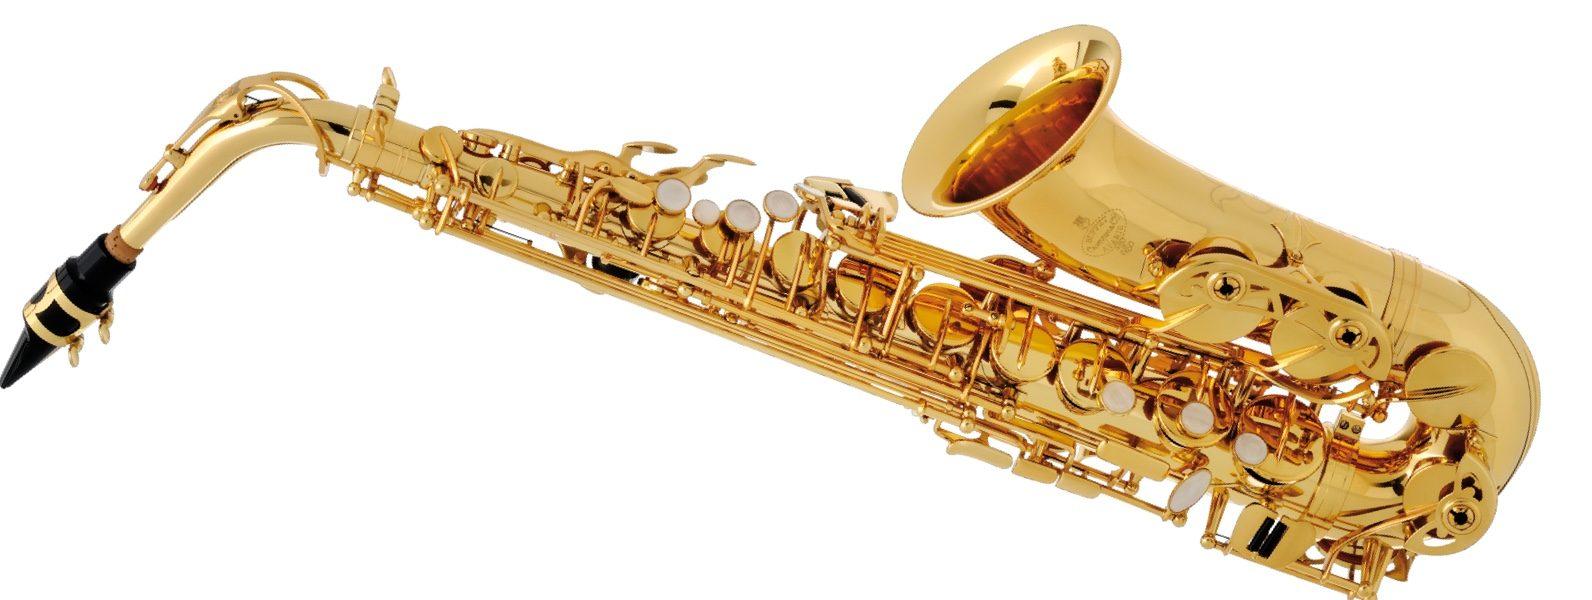 Phenomenal Saxophones Buffet Crampon Interior Design Ideas Lukepblogthenellocom